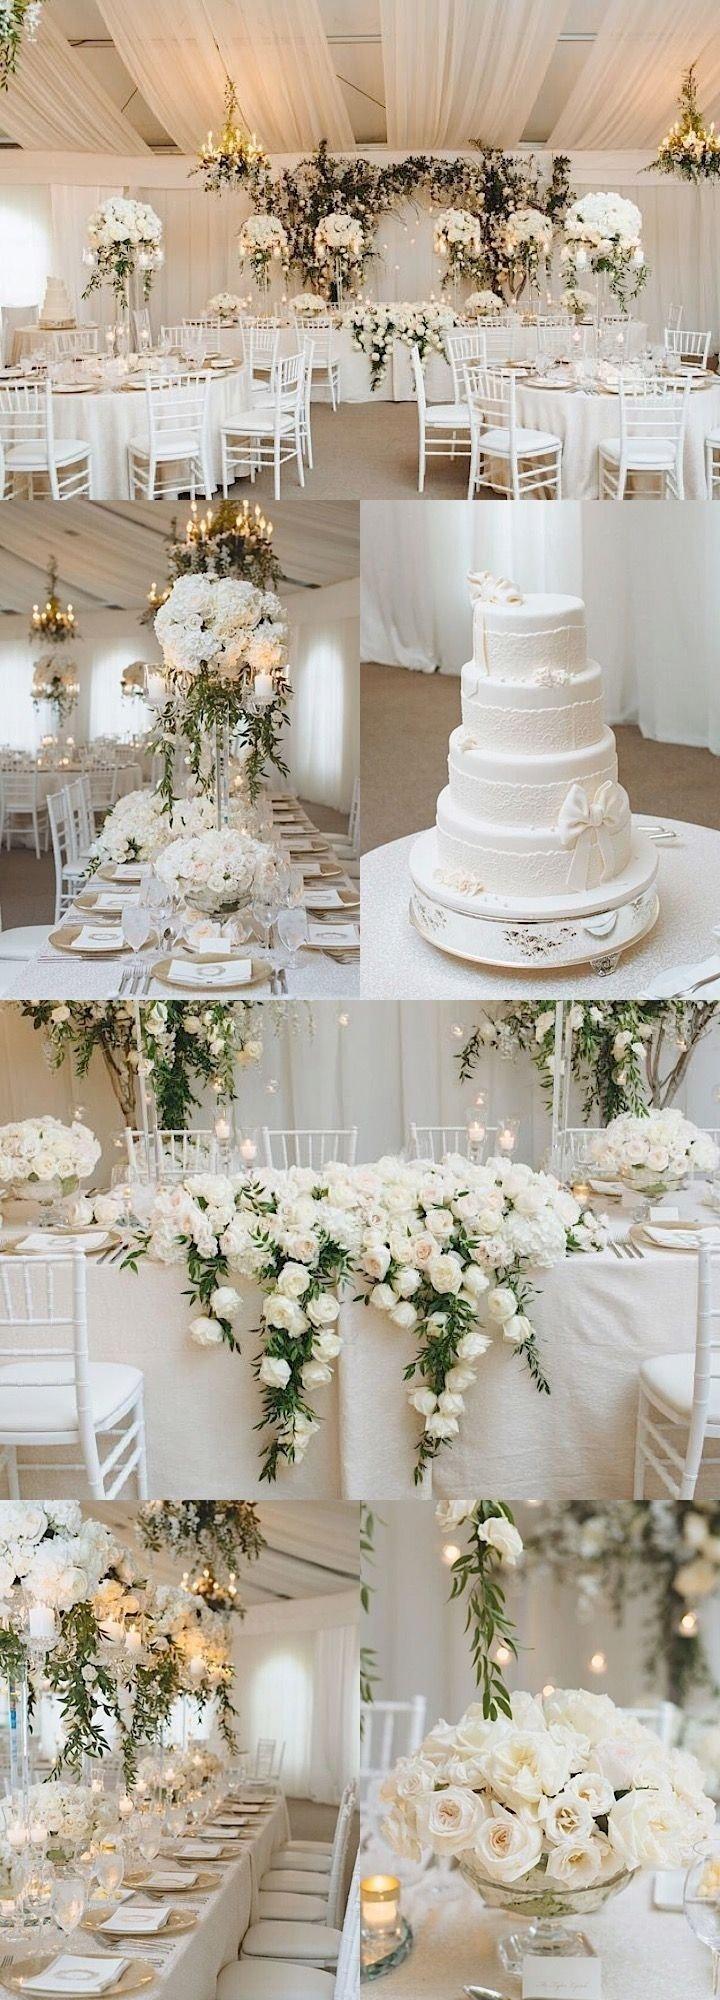 10 Unique Wedding Flowers And Reception Ideas 82 best wedding flowers images on pinterest wedding ideas 2020